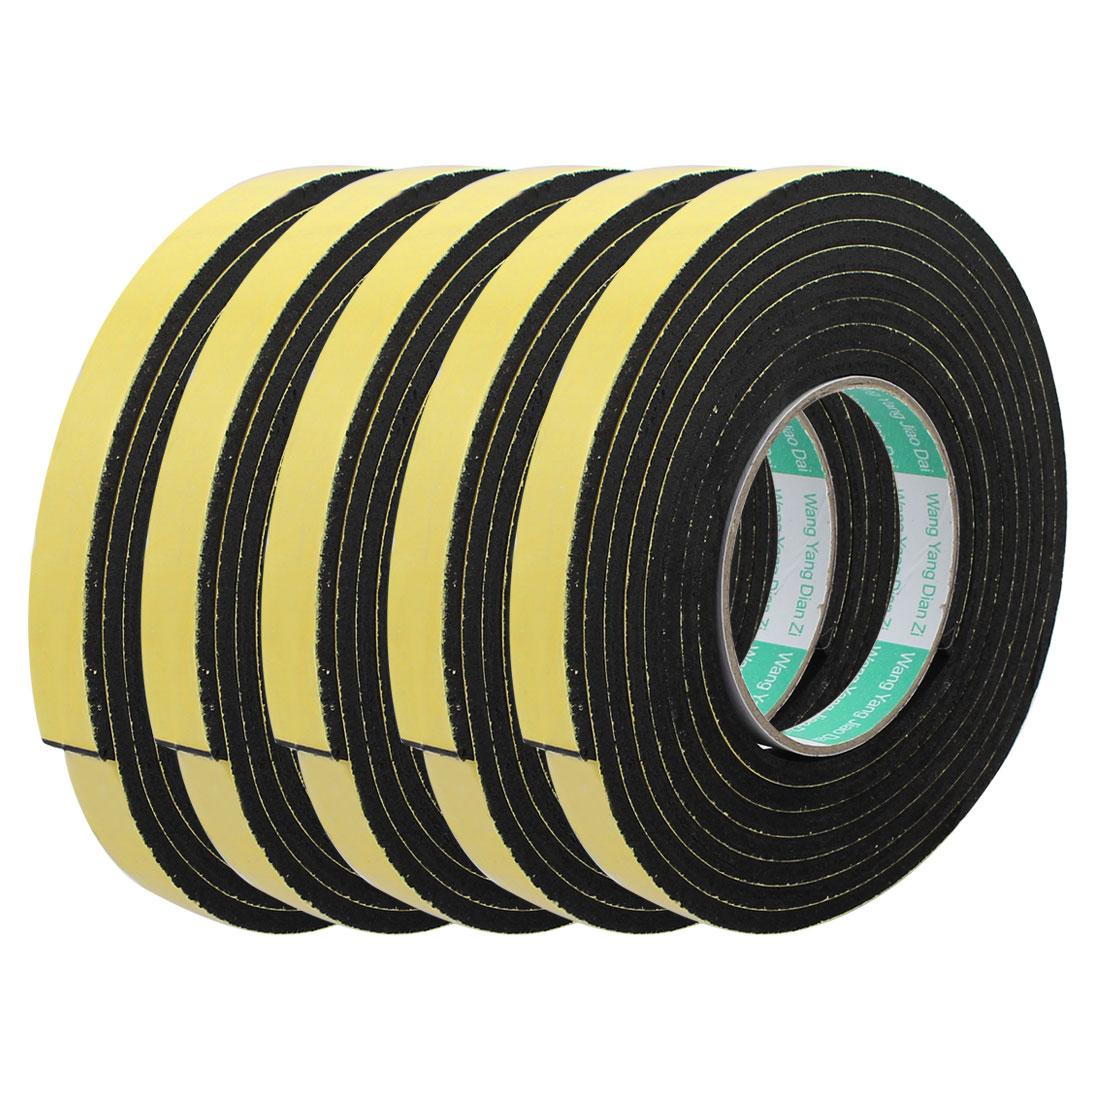 5pcs 3Meter 15mm x 5mm Single-side Adhesive Shockproof Sponge Foam Tape Yellow